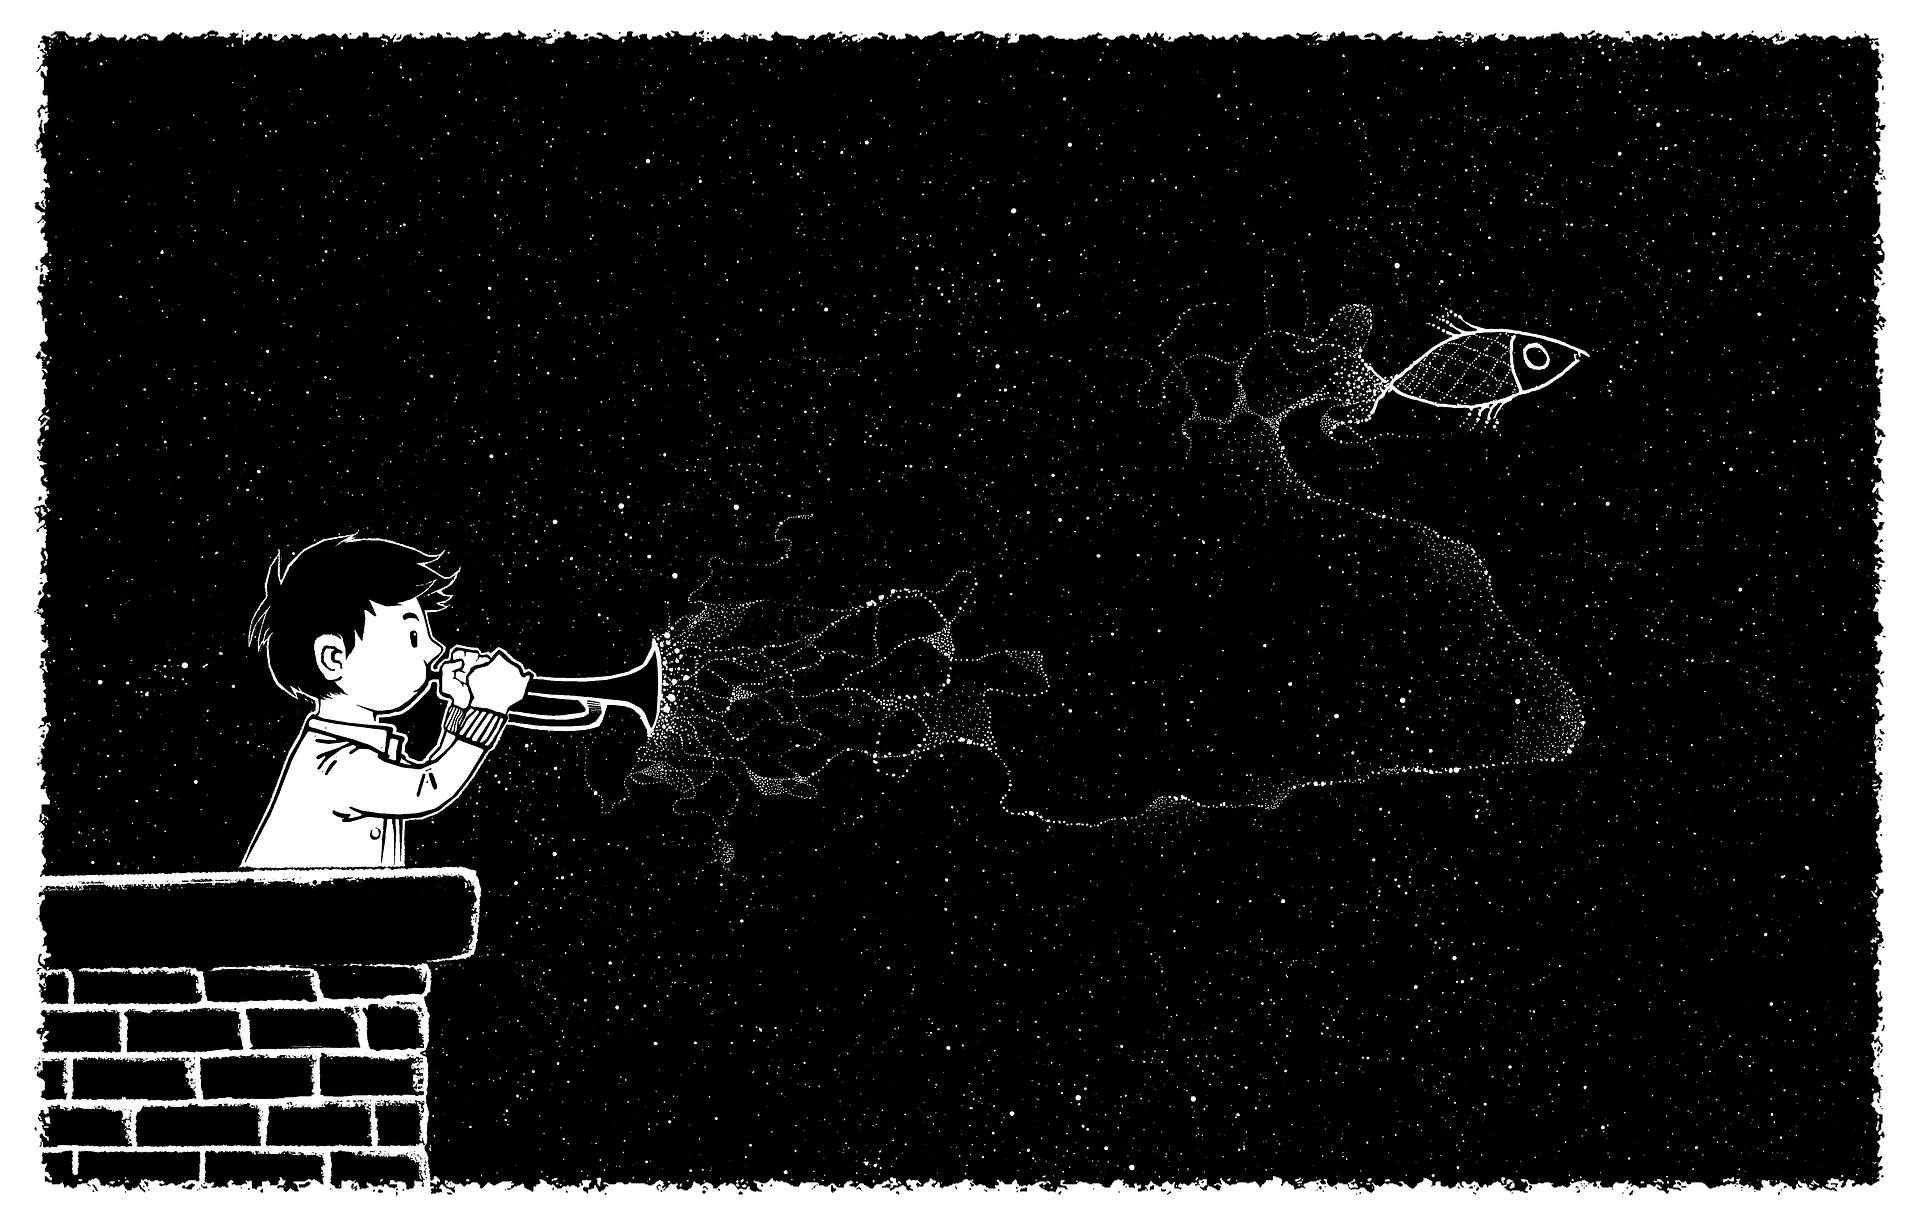 fairy-tale-1180919_1920